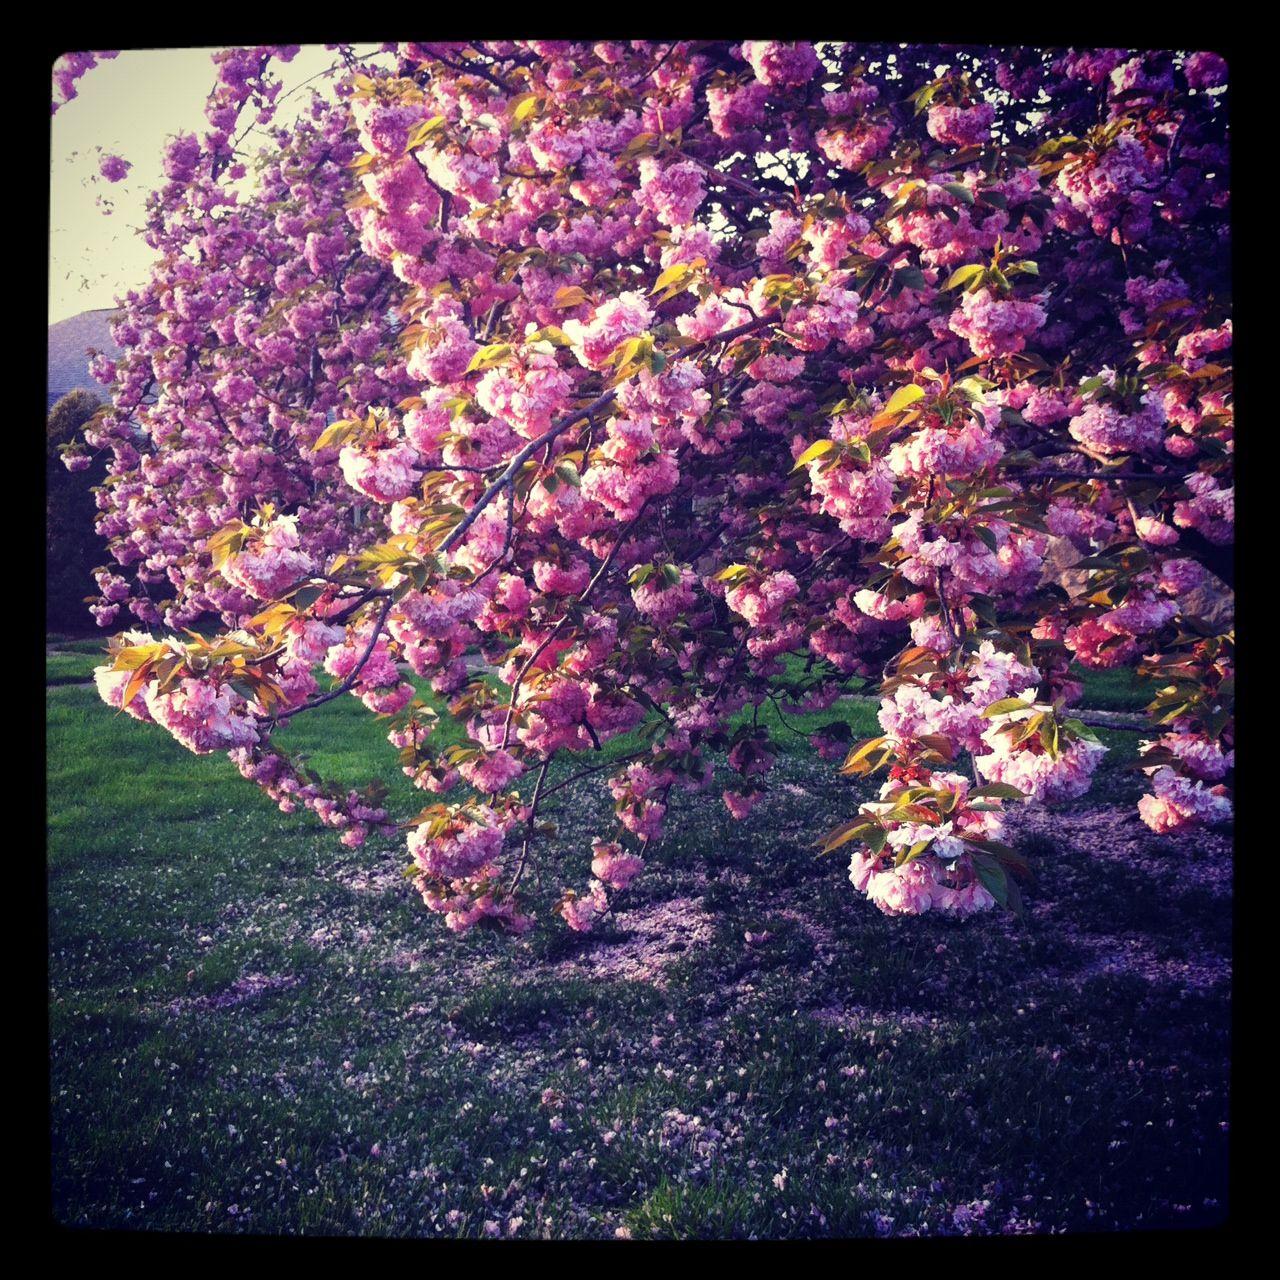 Pink Flower Trees In Kentucky Pretty Trees Flowering Trees Pink Flowers